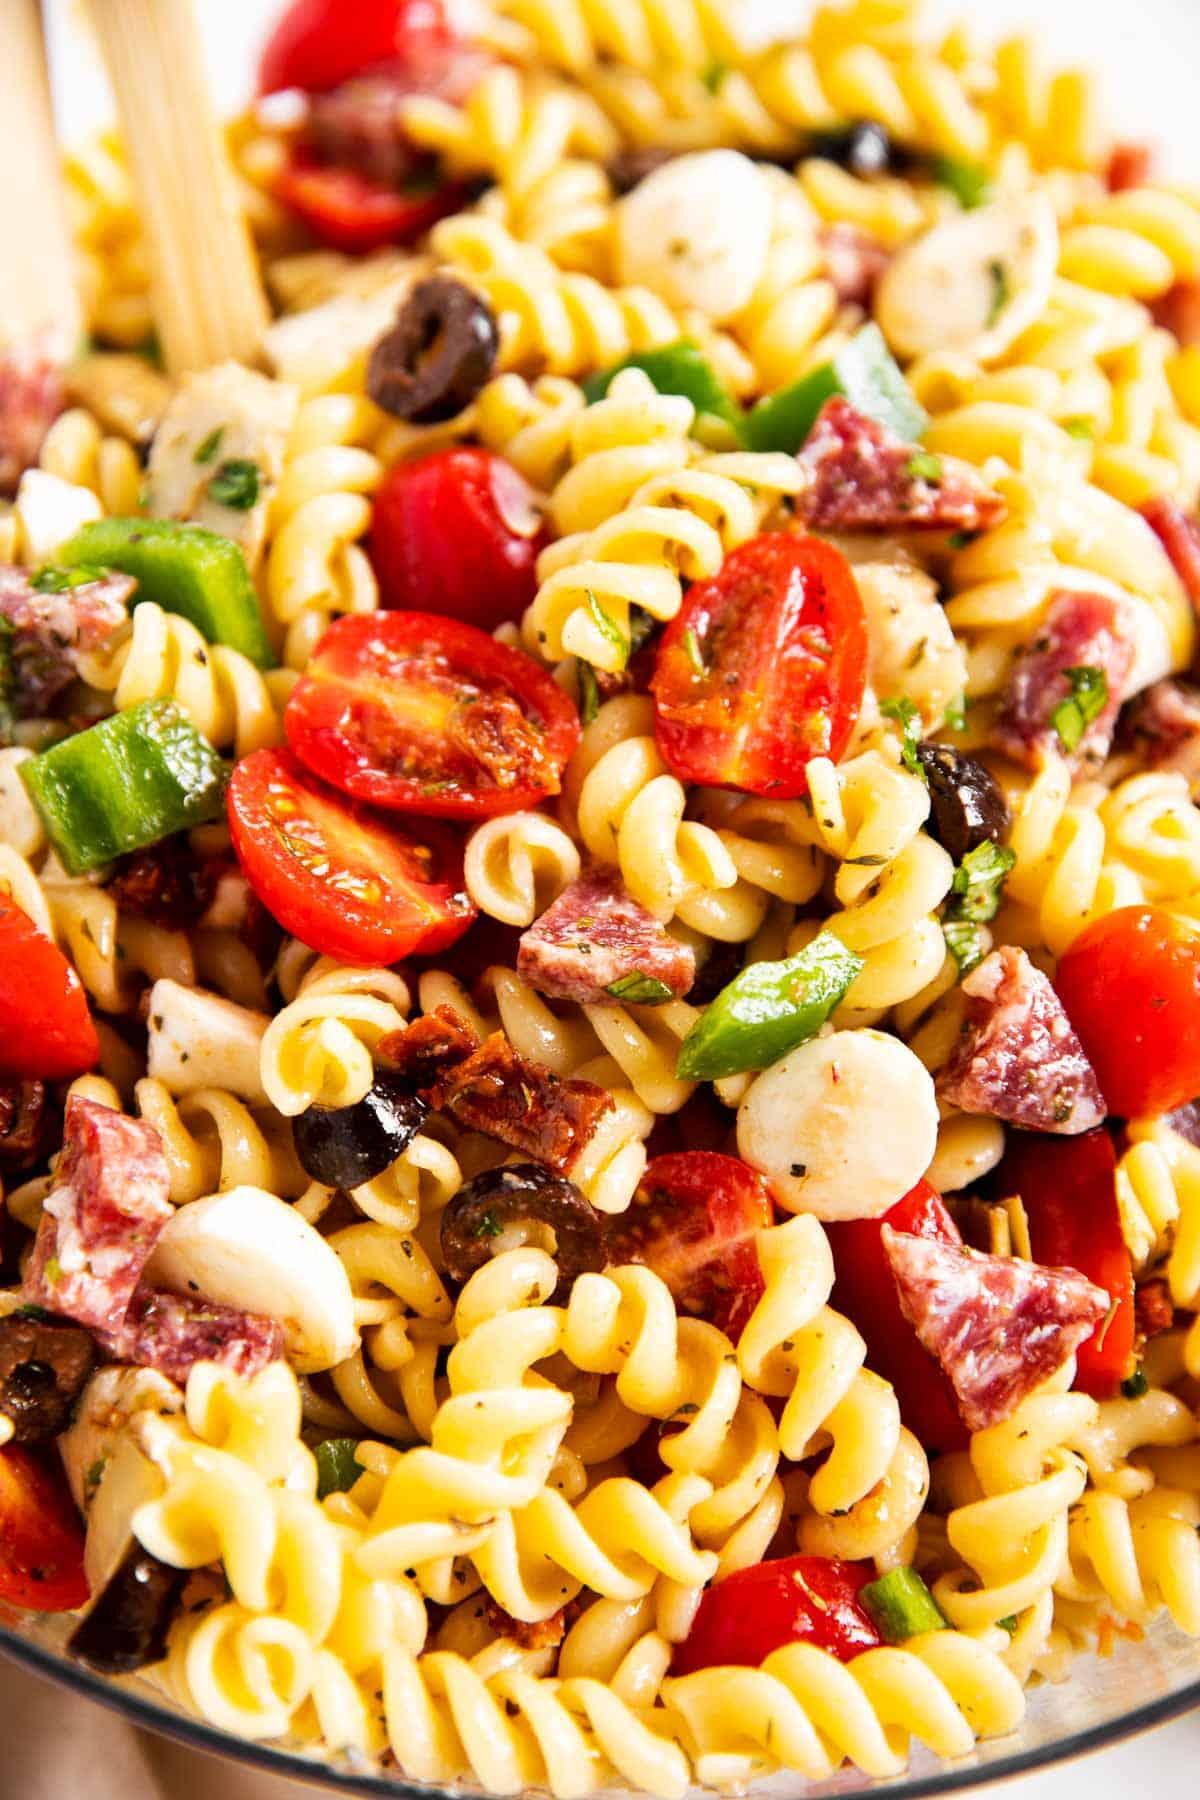 close up photo of Italian pasta salad